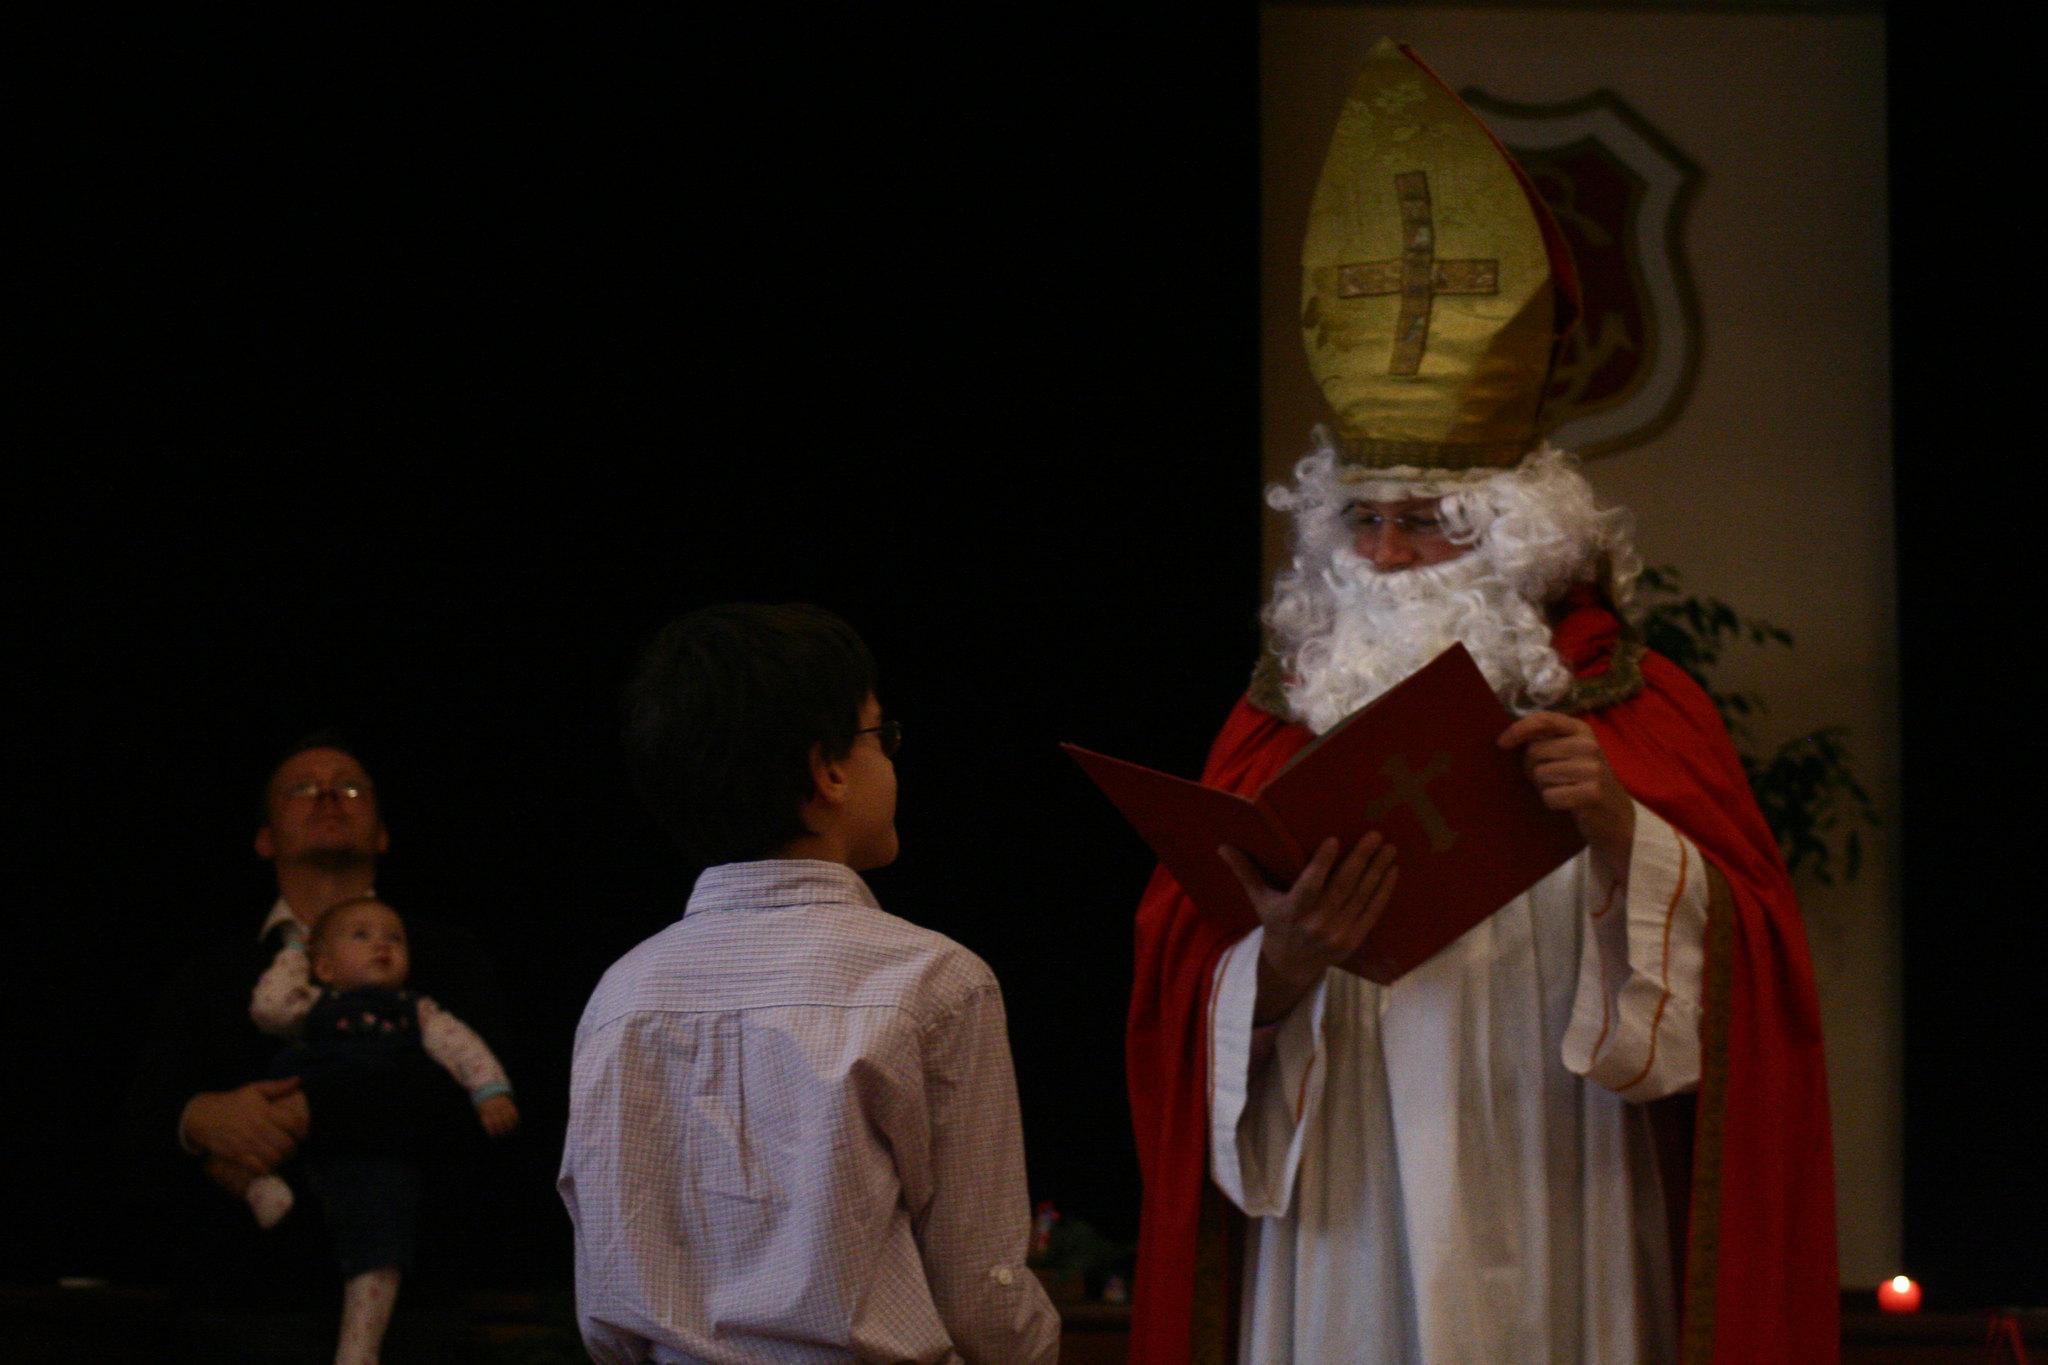 Sankt Nikolaus consults his book